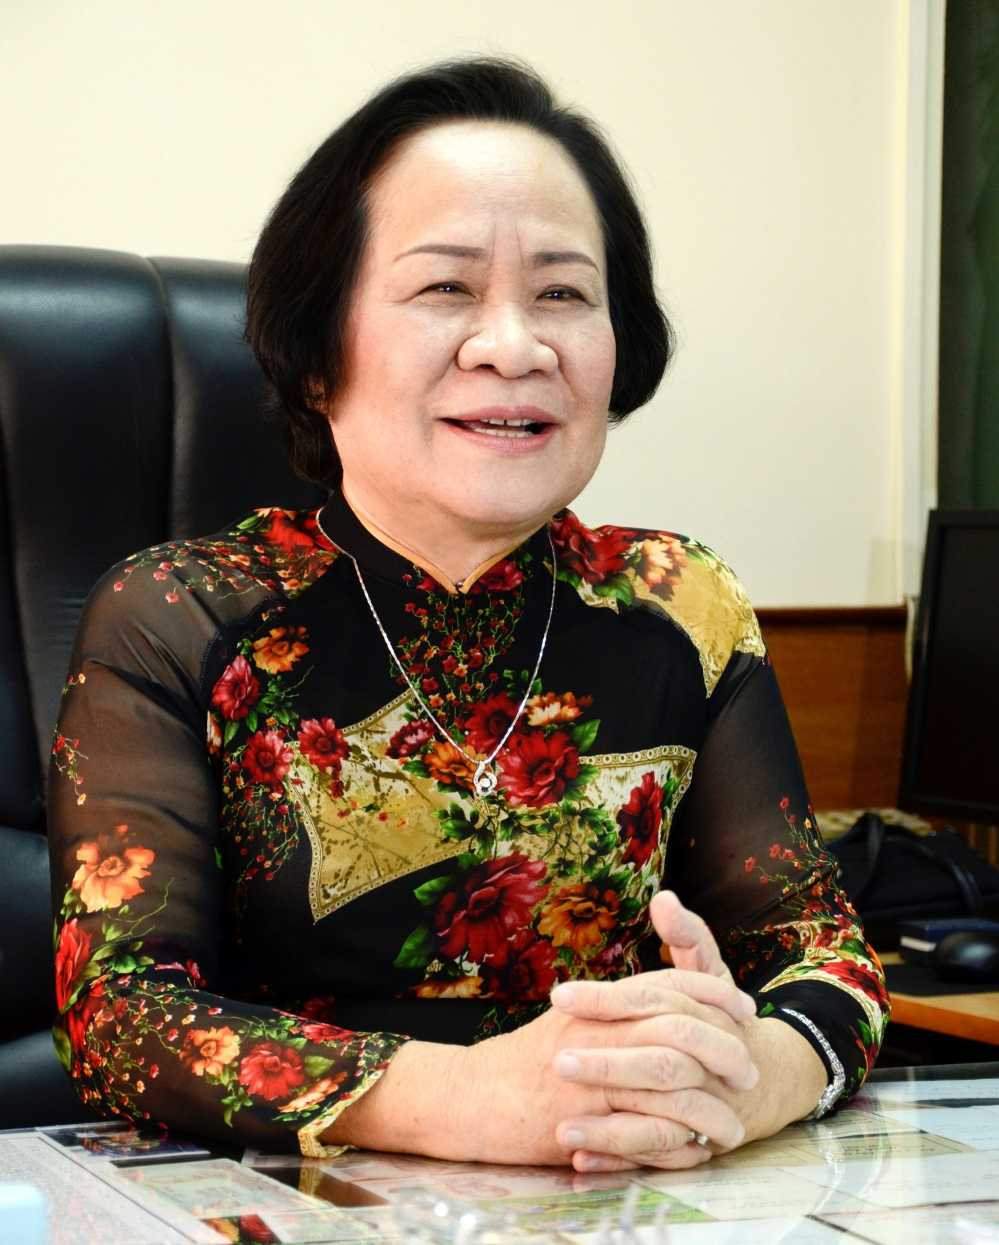 Duoc Hau Giang dong hanh cung nganh Y qua 'Dac nhiem Blouse Trang' hinh anh 2